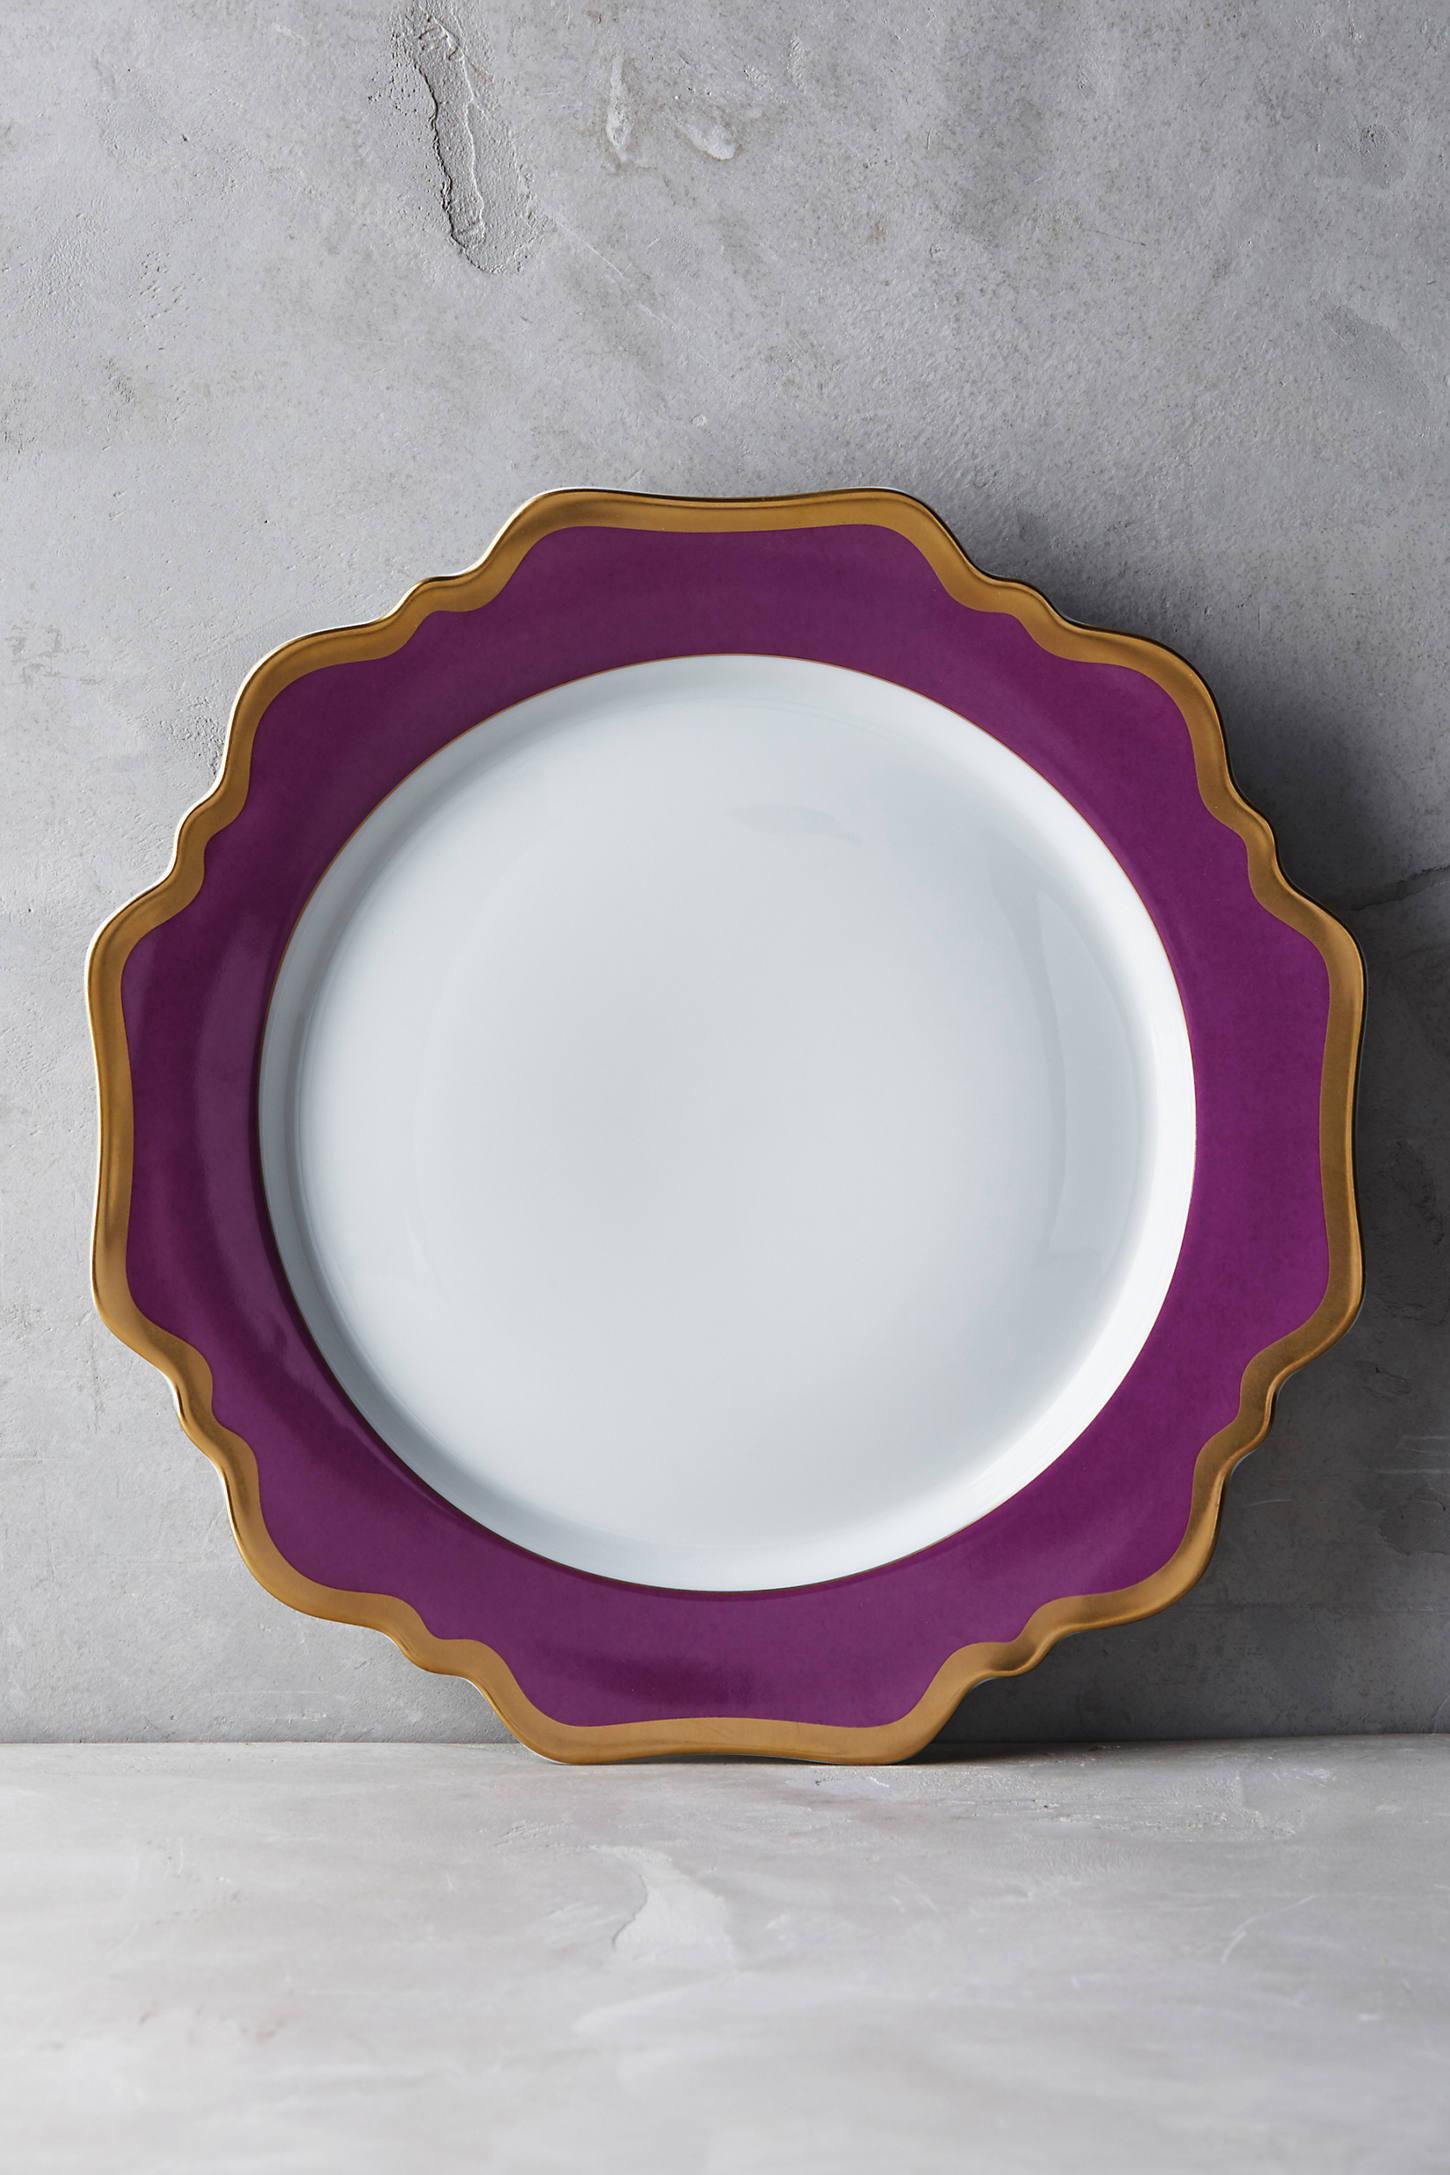 Anna's Palette Dinner Plate